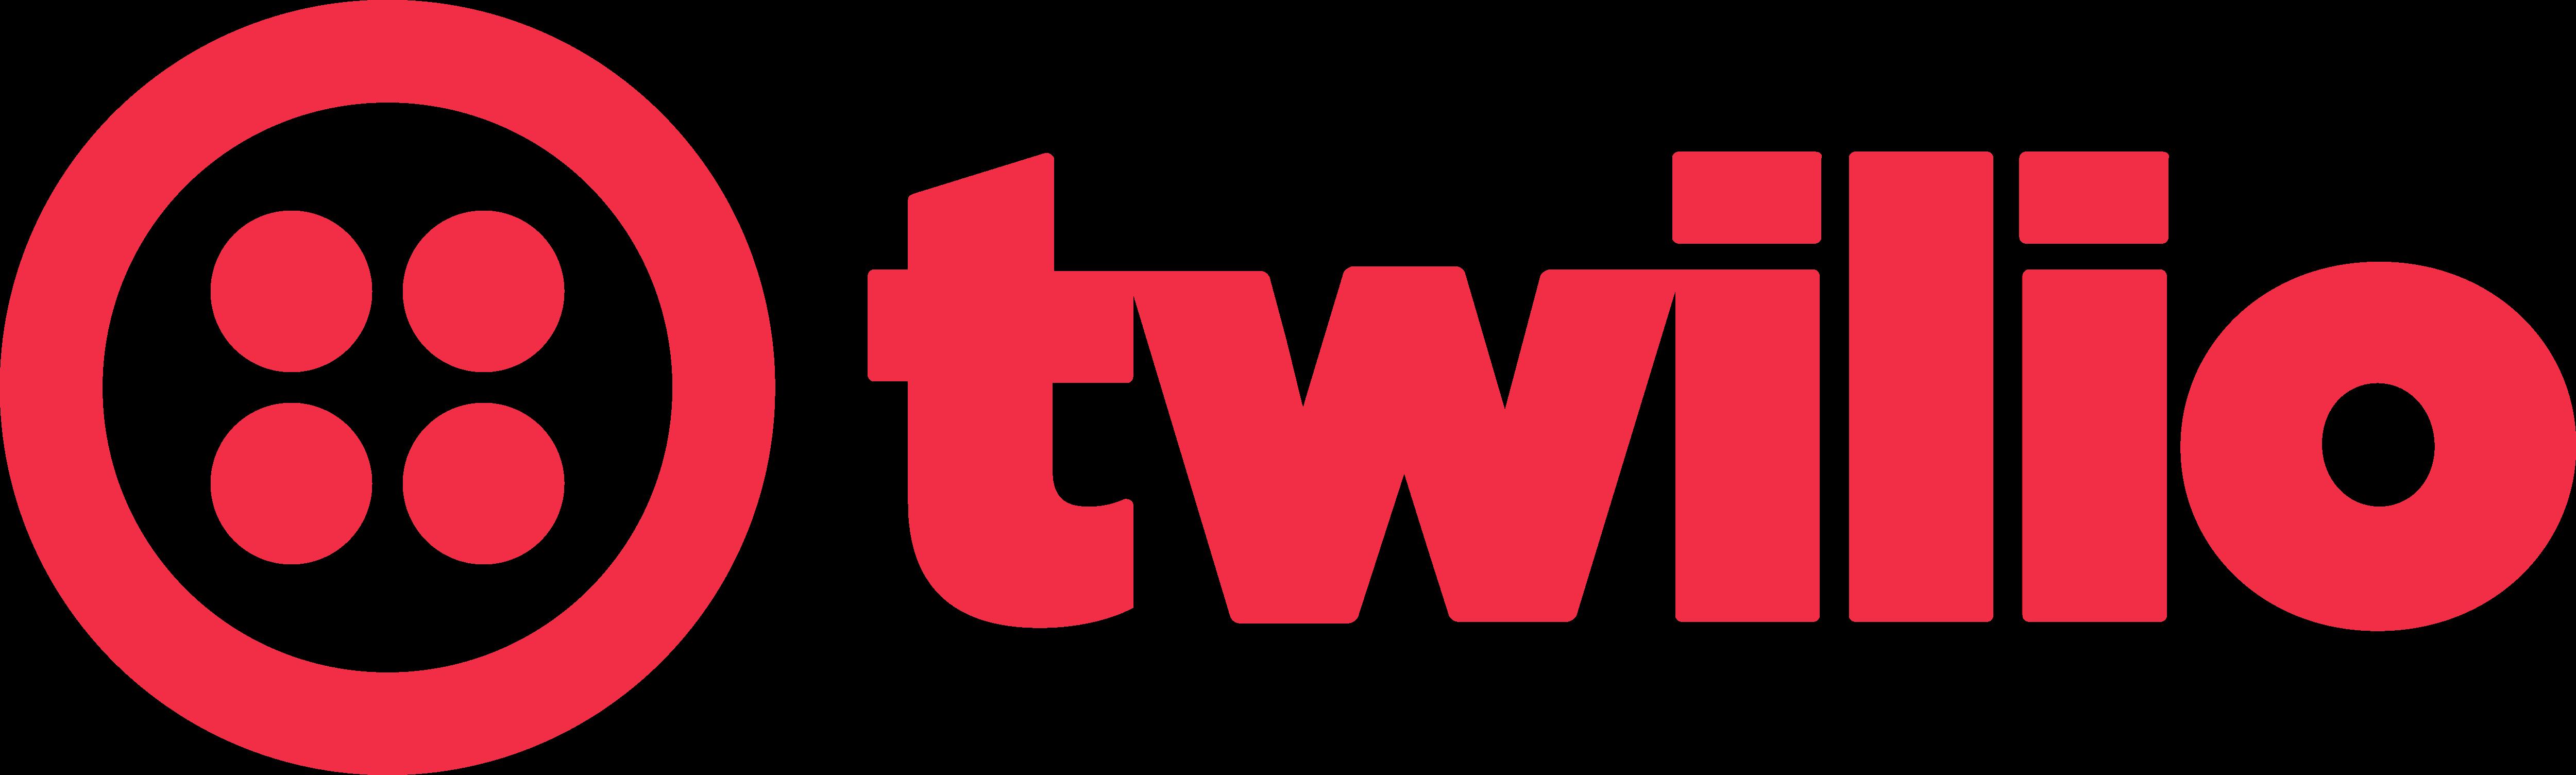 Twilio Heightened Awareness Period for U.S. Elections - Twilio